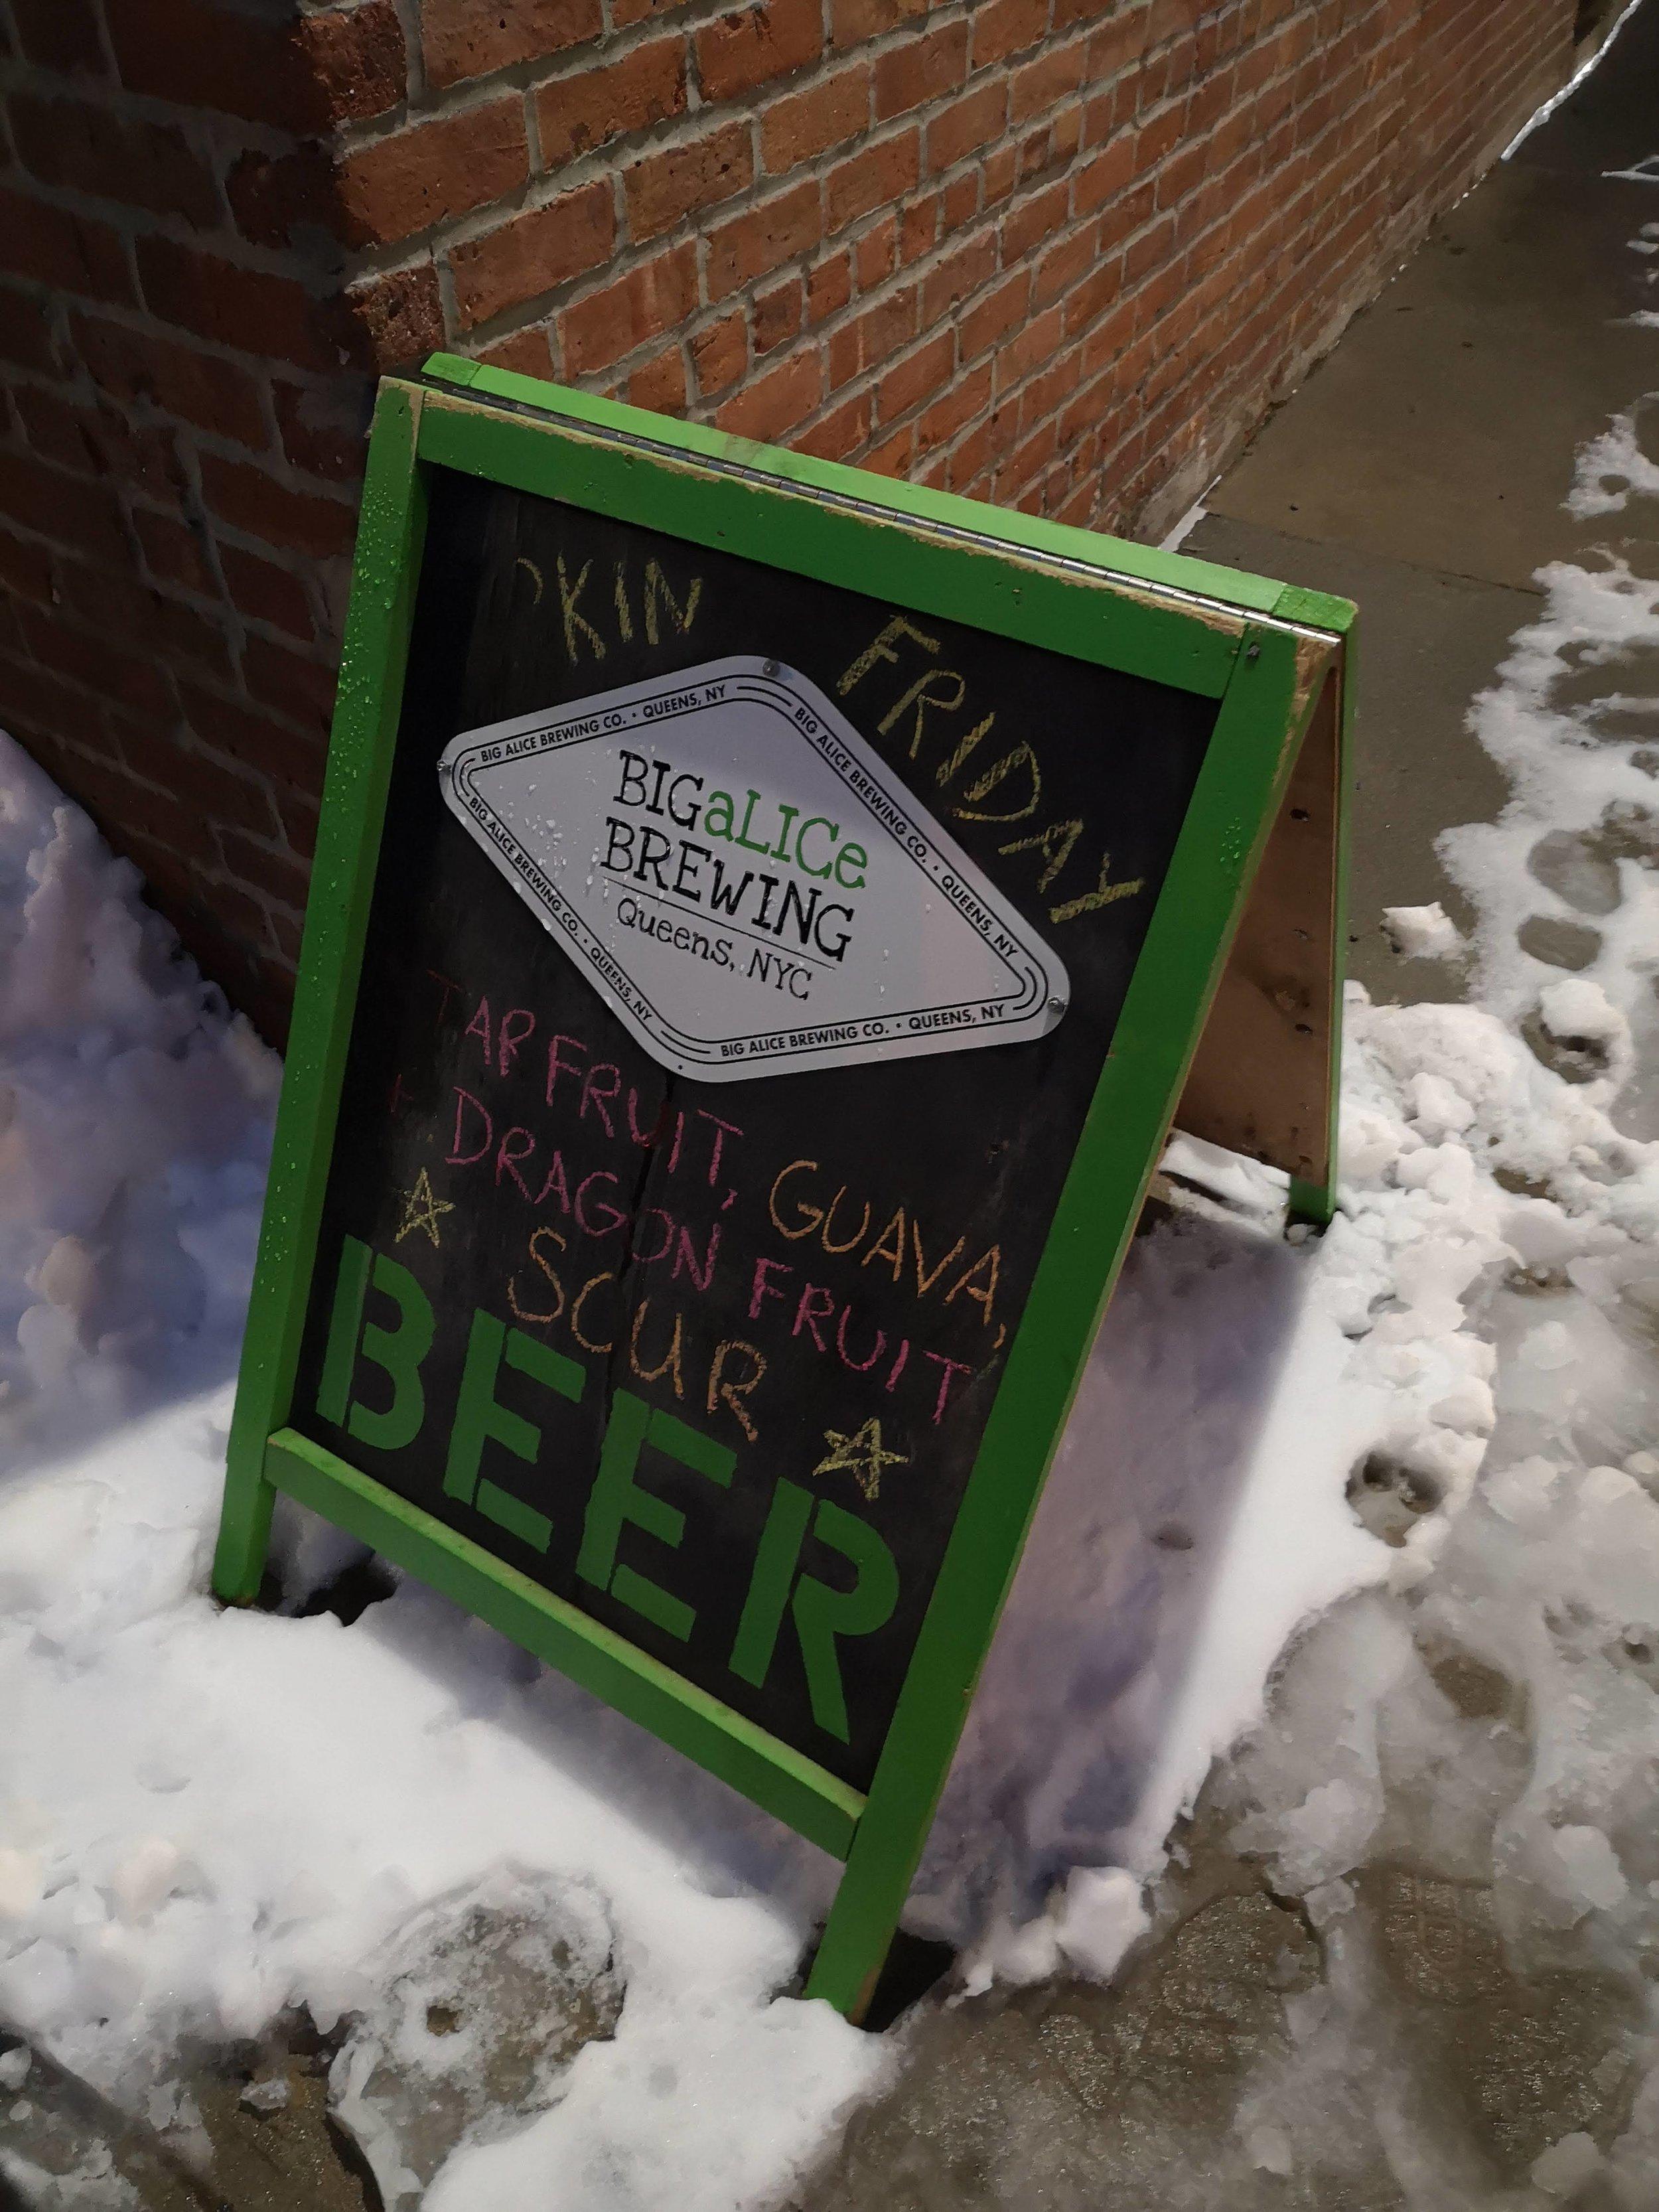 Big aLICe Brewing new york sign.jpg